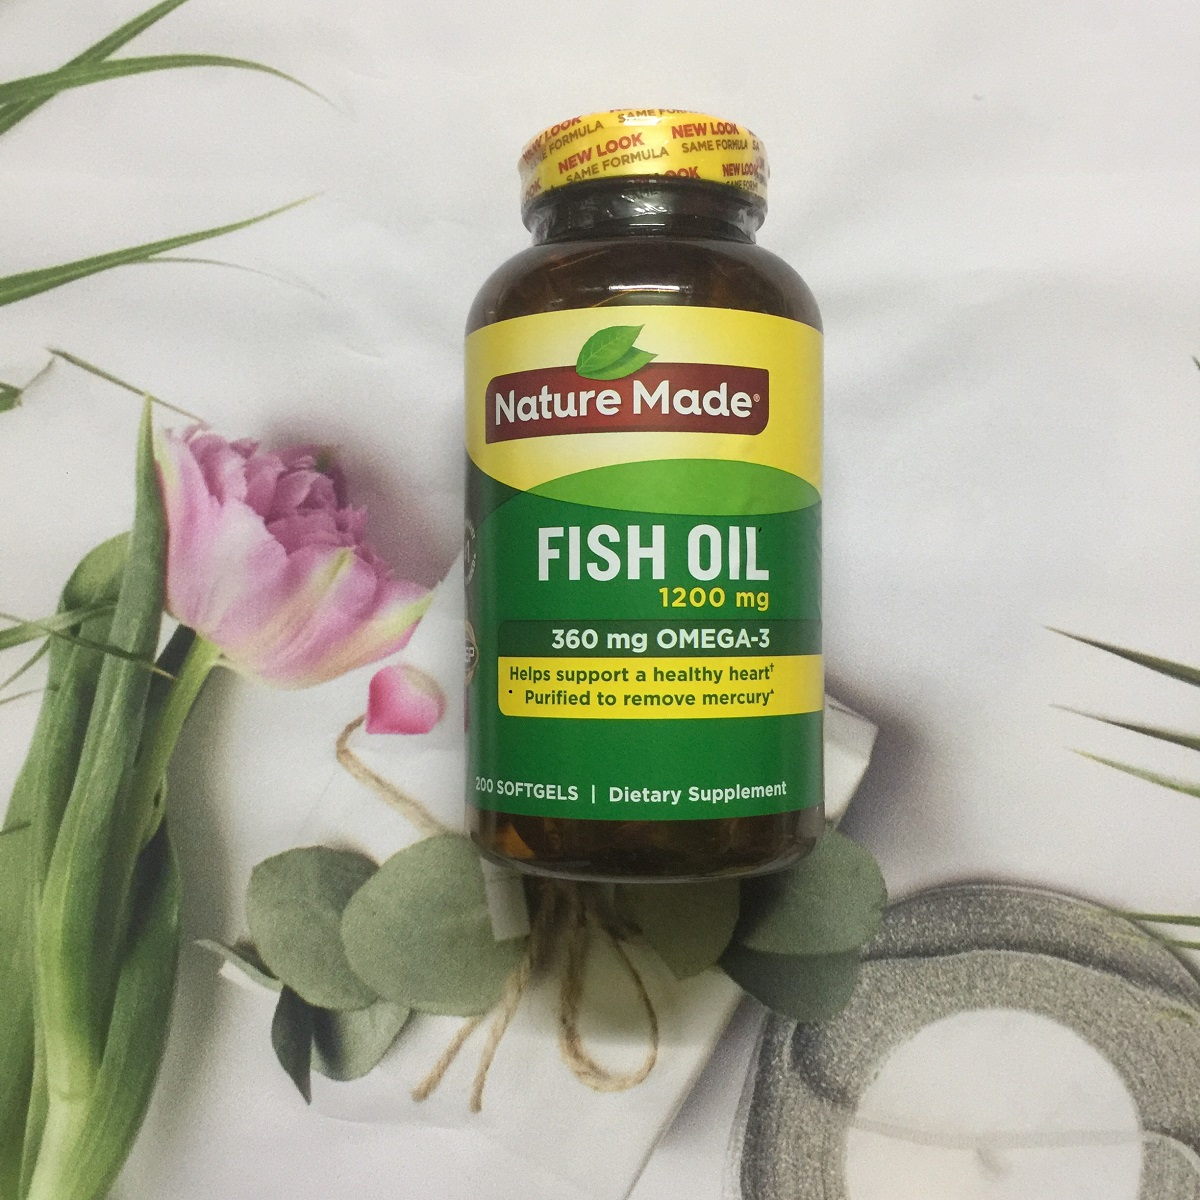 Dầu cá Omega 3 - Nature Made Fish Oil 1200mg